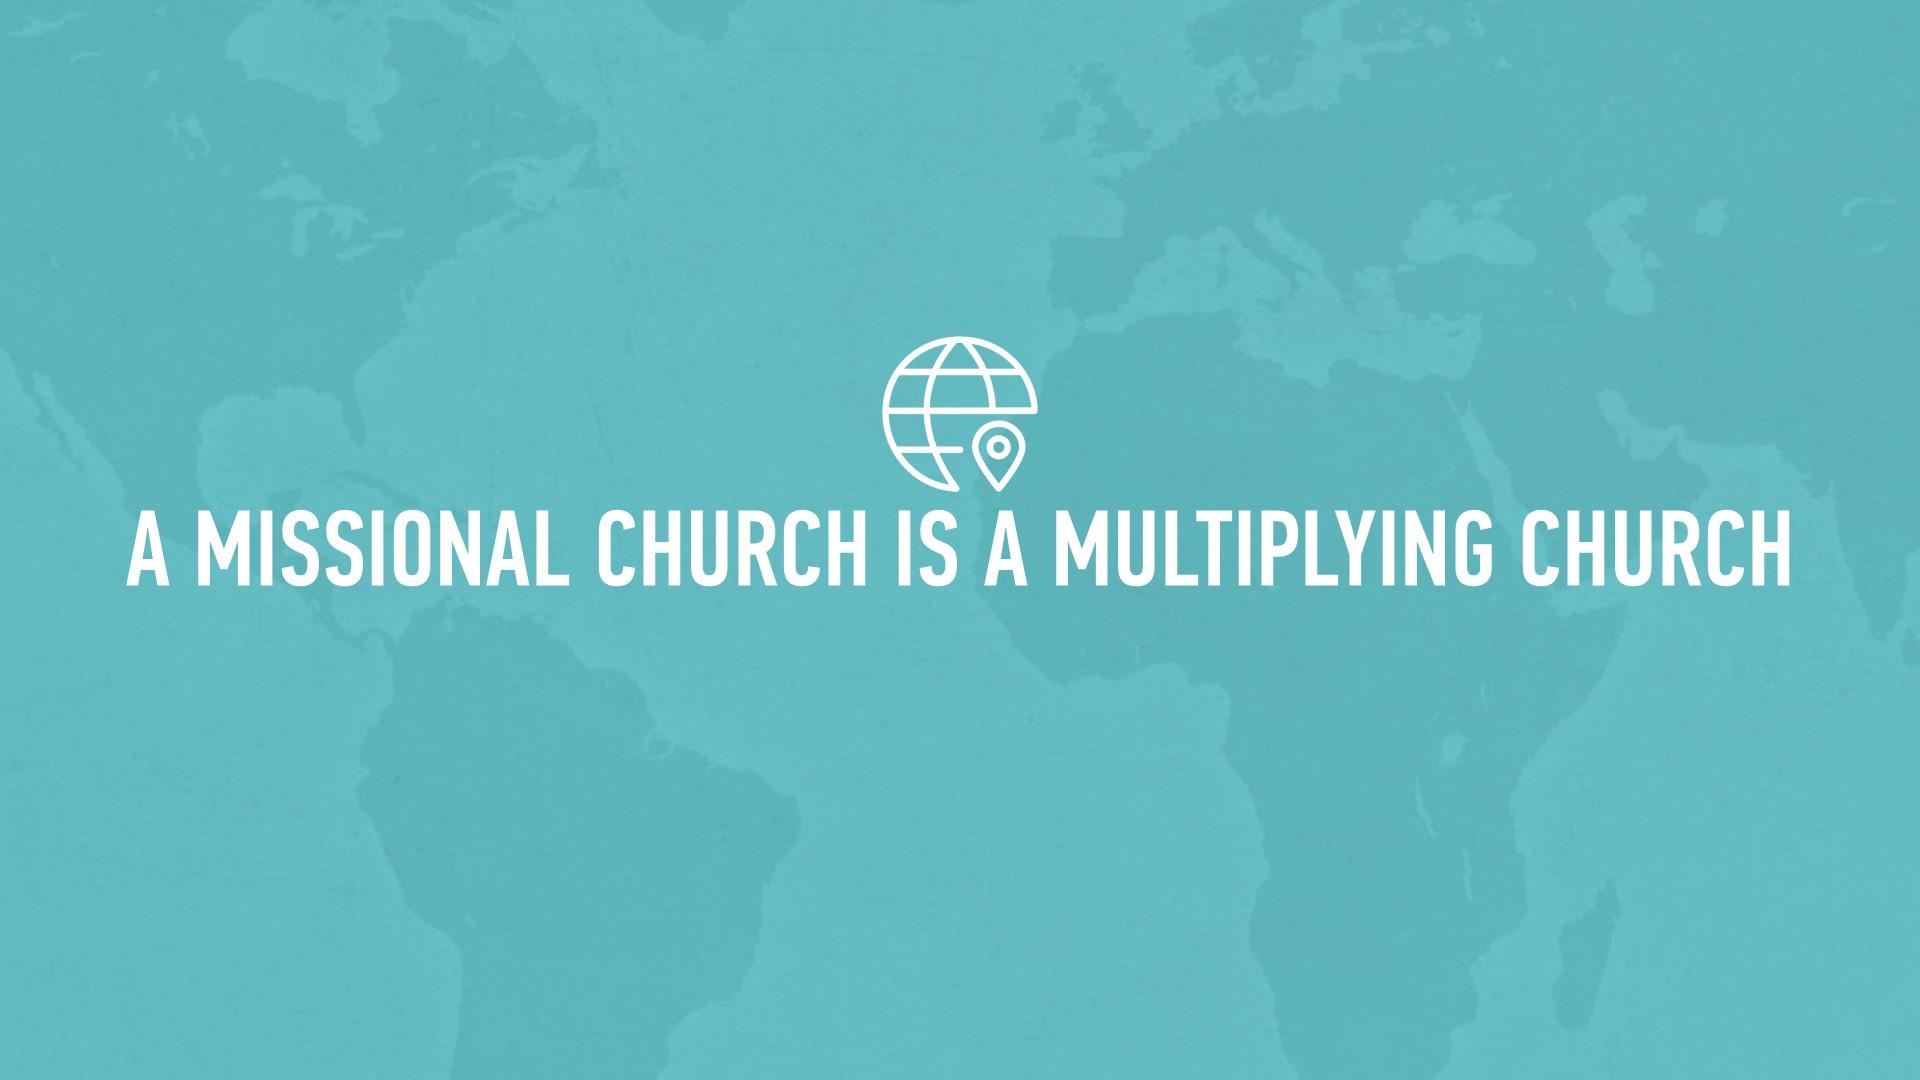 20190818 A MISSIONAL CHURCH IS A MULTIPLYING CHURCH.JPG